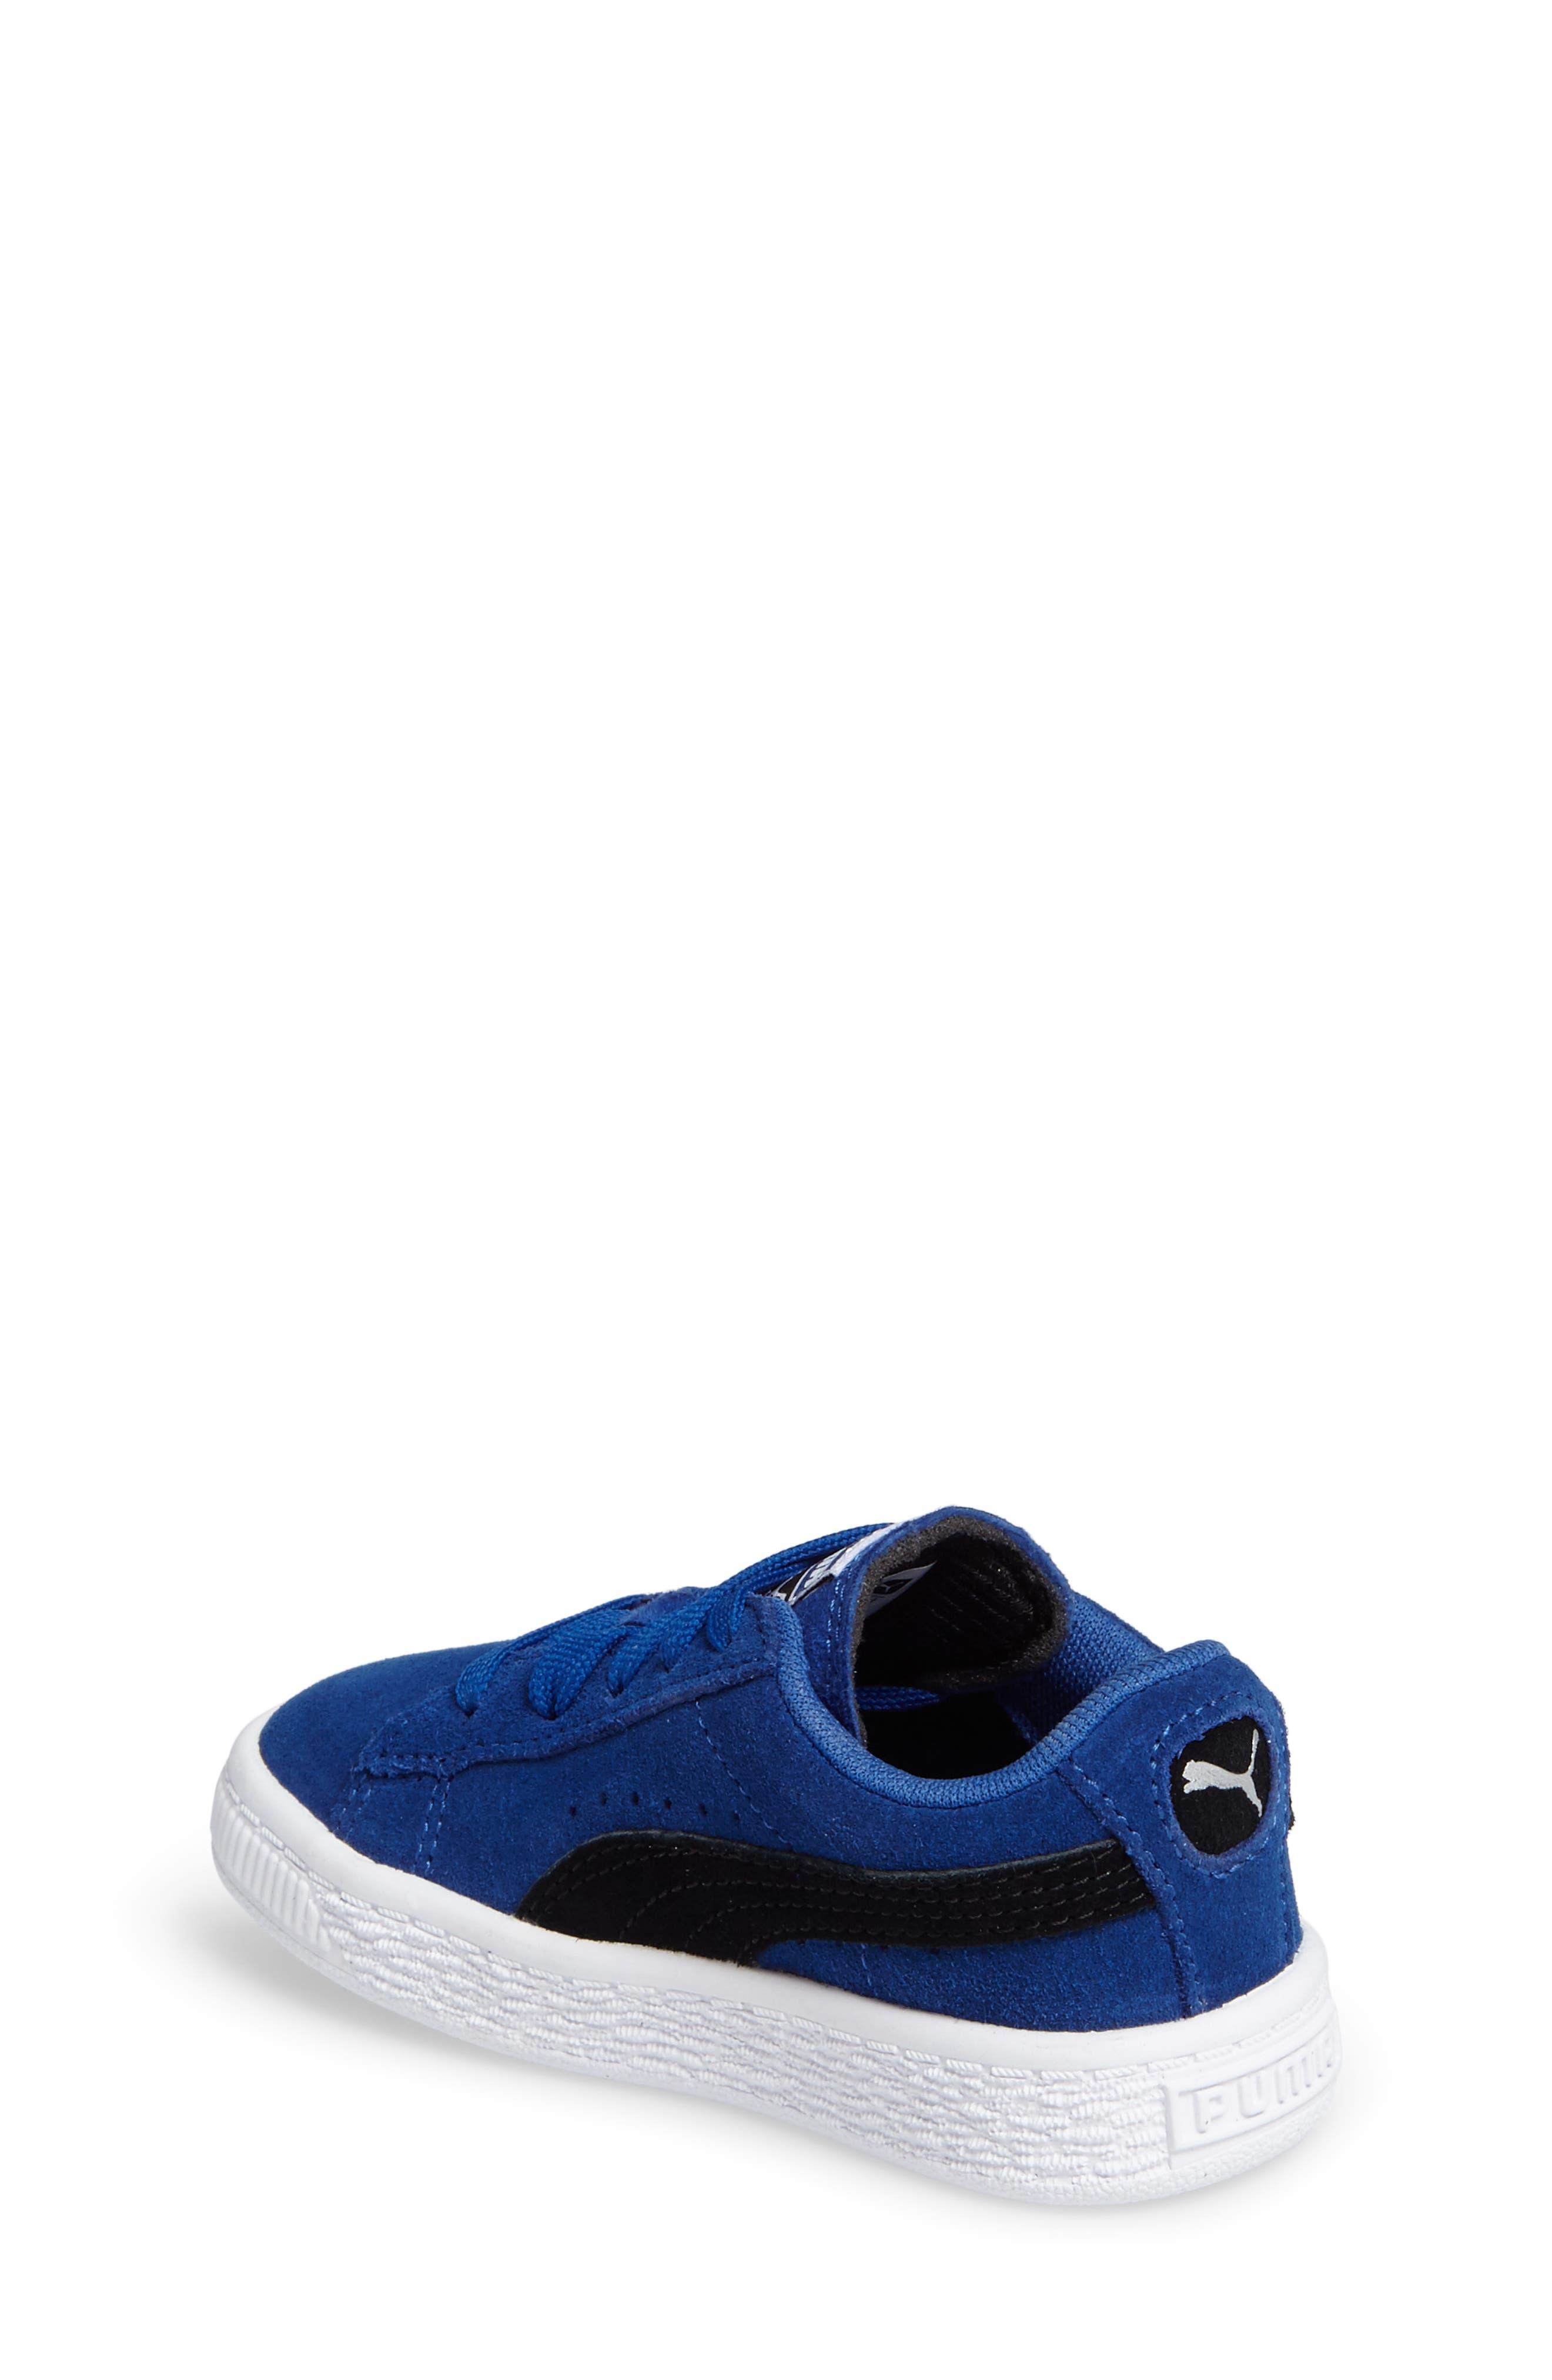 'Suede'Sneaker,                             Alternate thumbnail 2, color,                             Blue/ Black